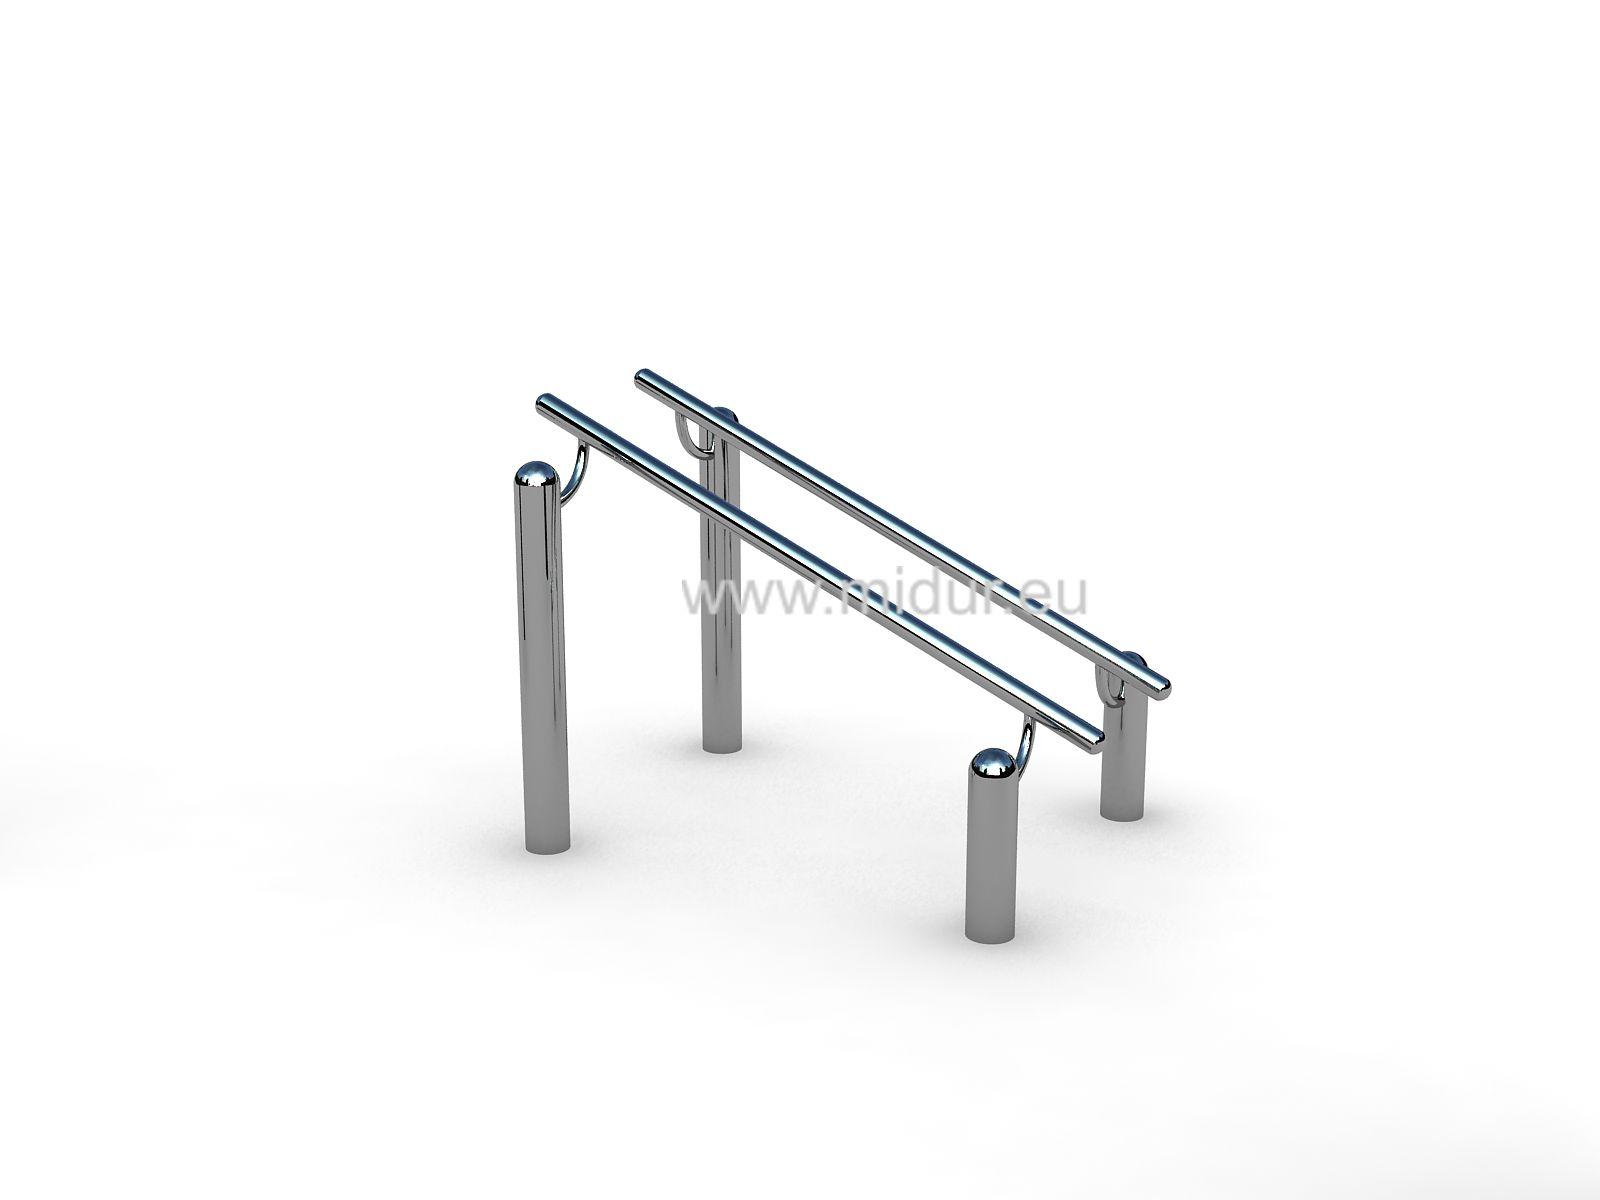 Tricepsové kliky na bradlech Steel 12 Venkovní posílovací bradla